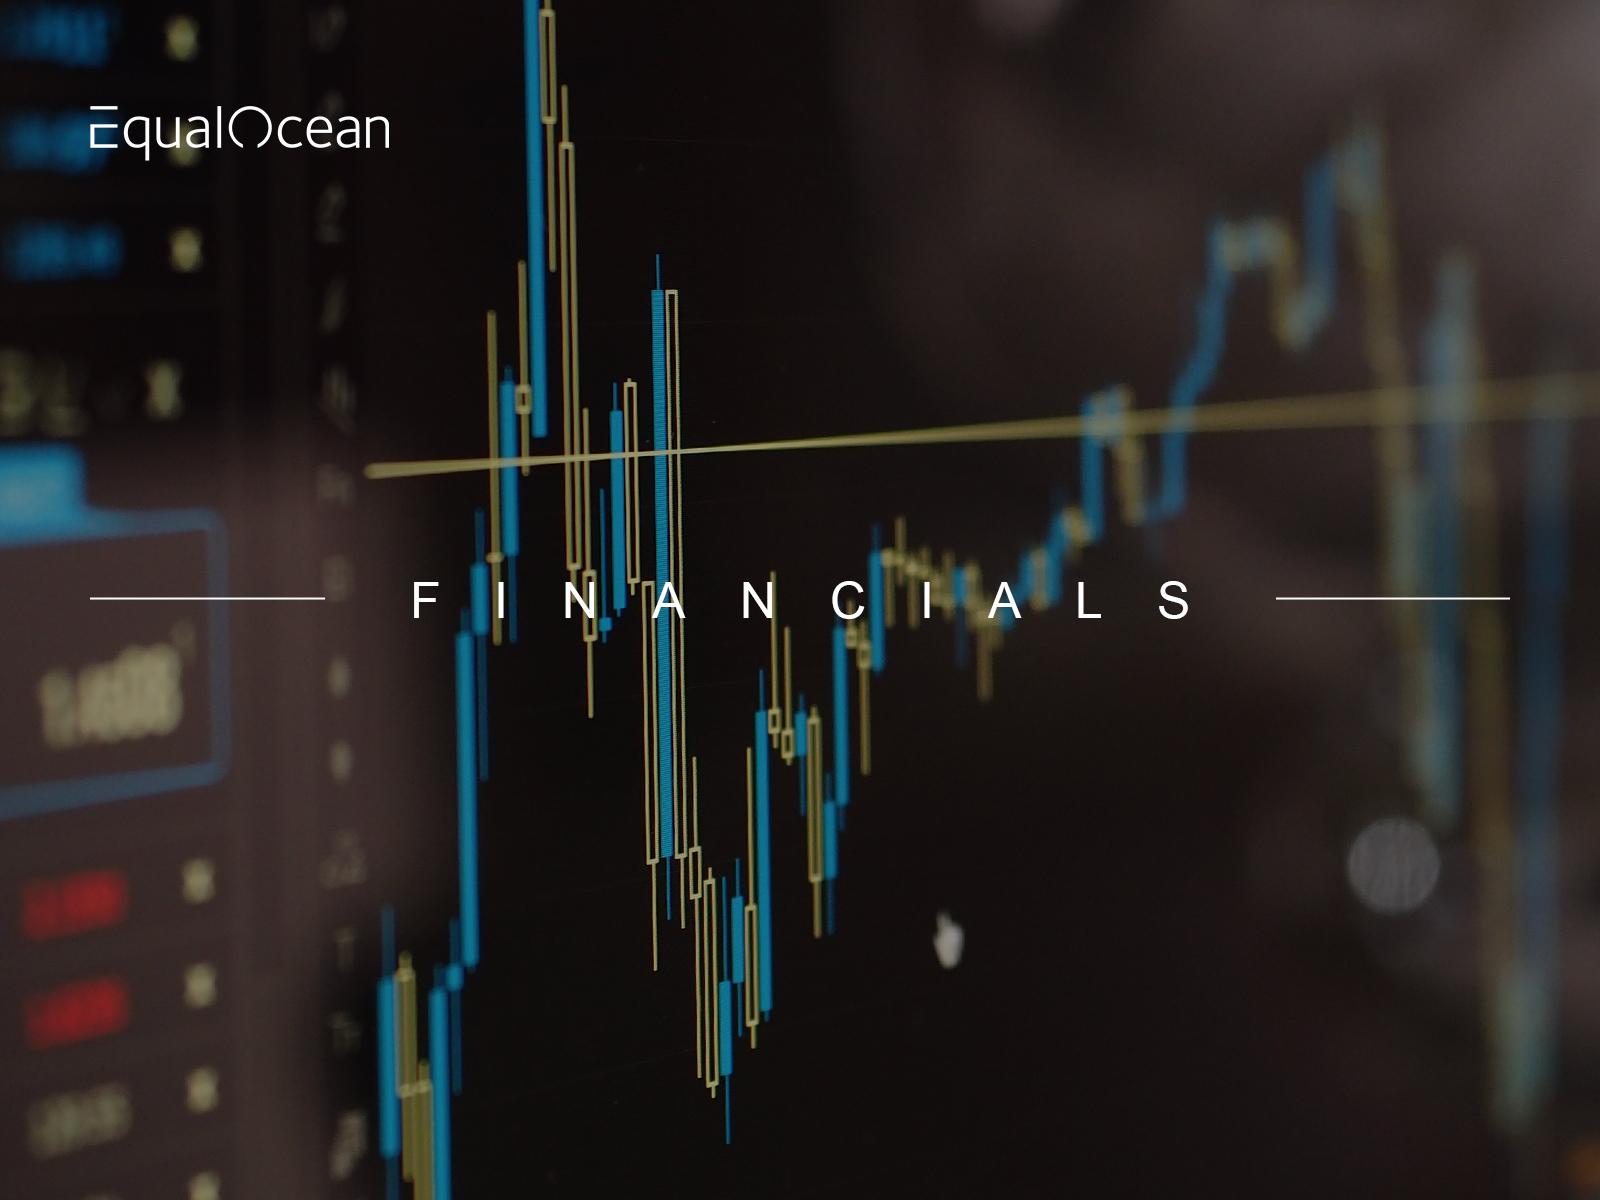 Market watch. Image credit: EqualOcean